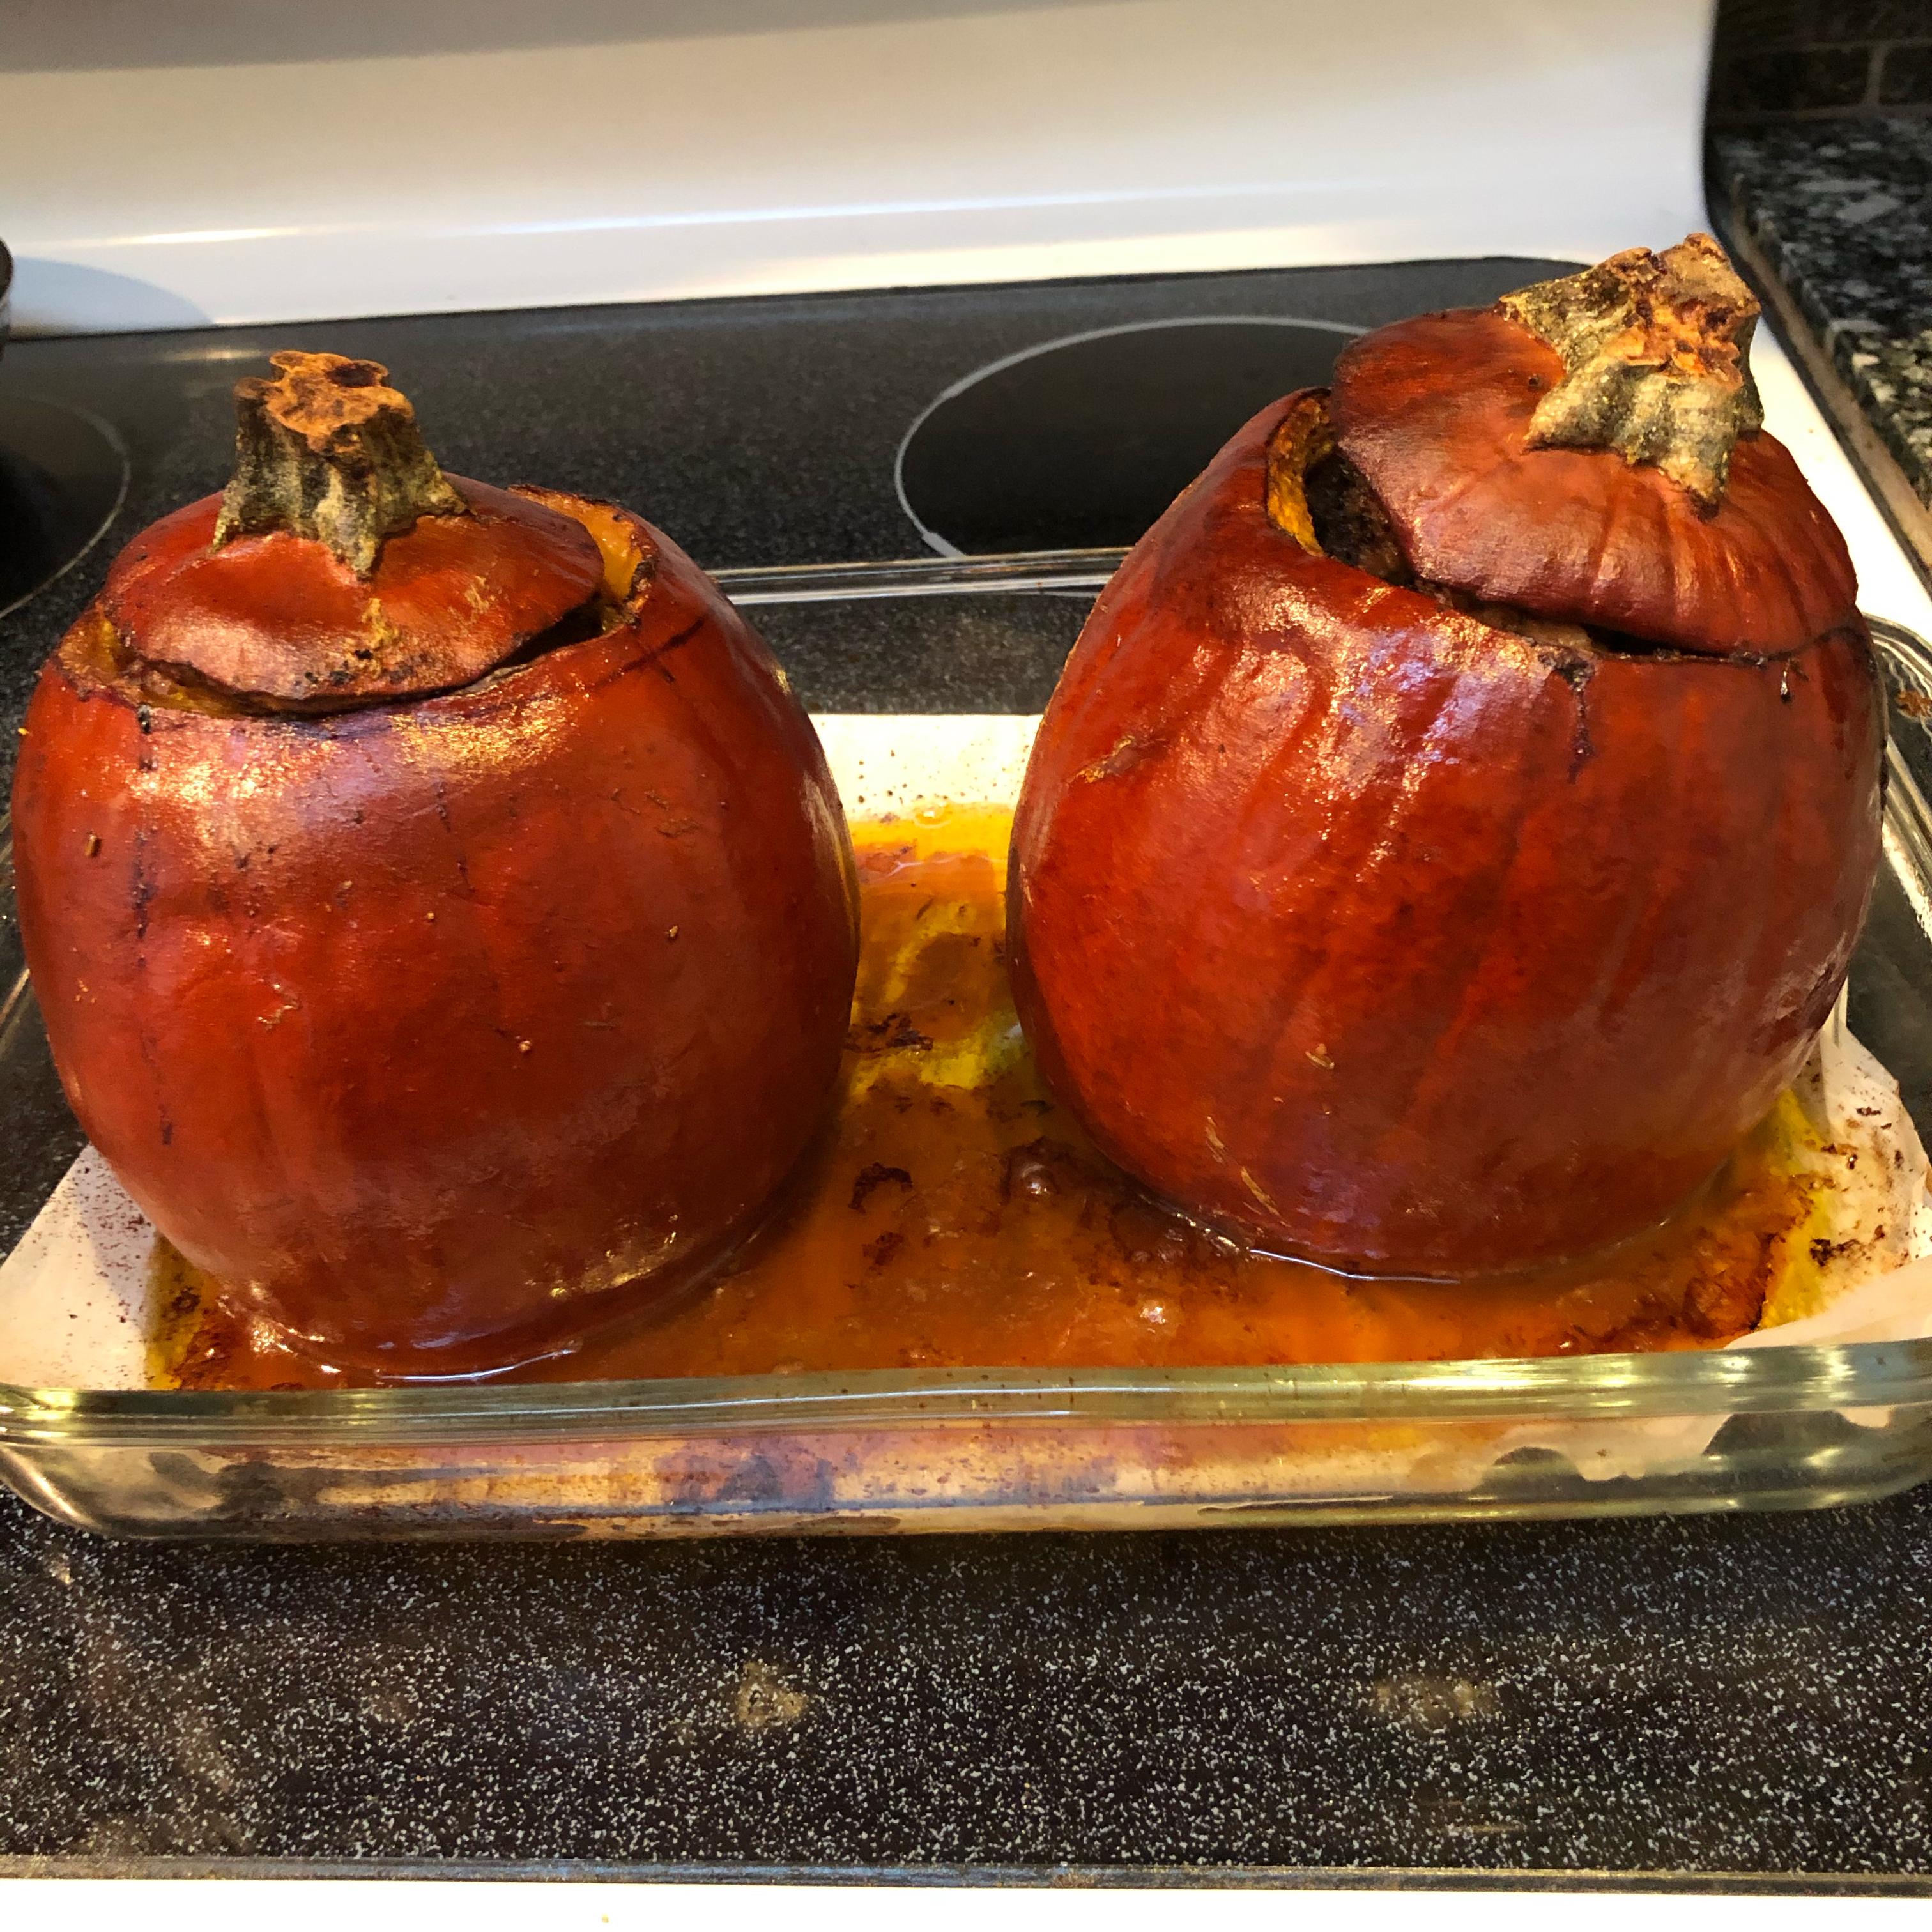 Chef John's Pumpkin-Braised Pork Michelle Orton